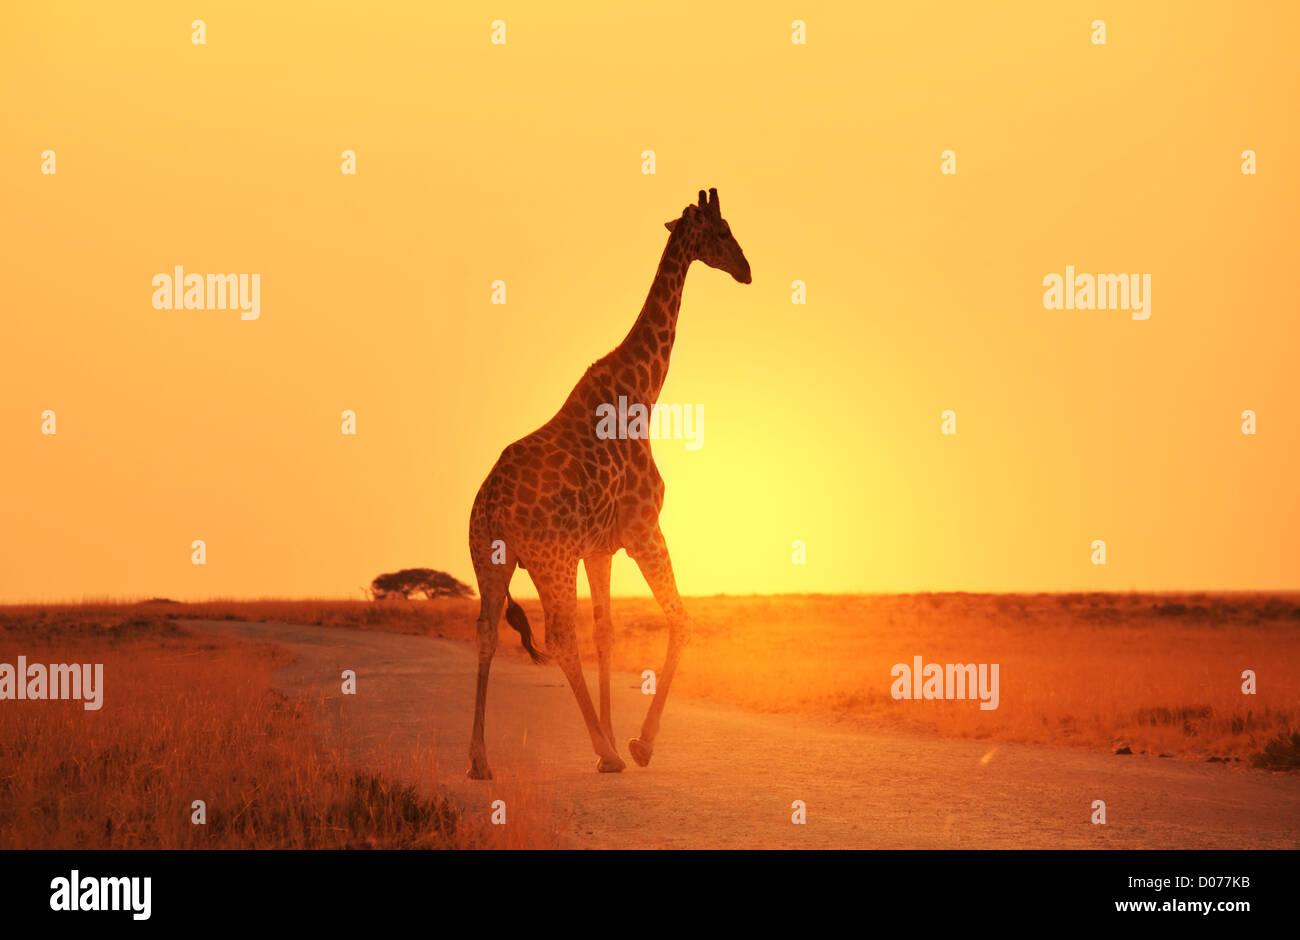 Jirafa en savannah Imagen De Stock